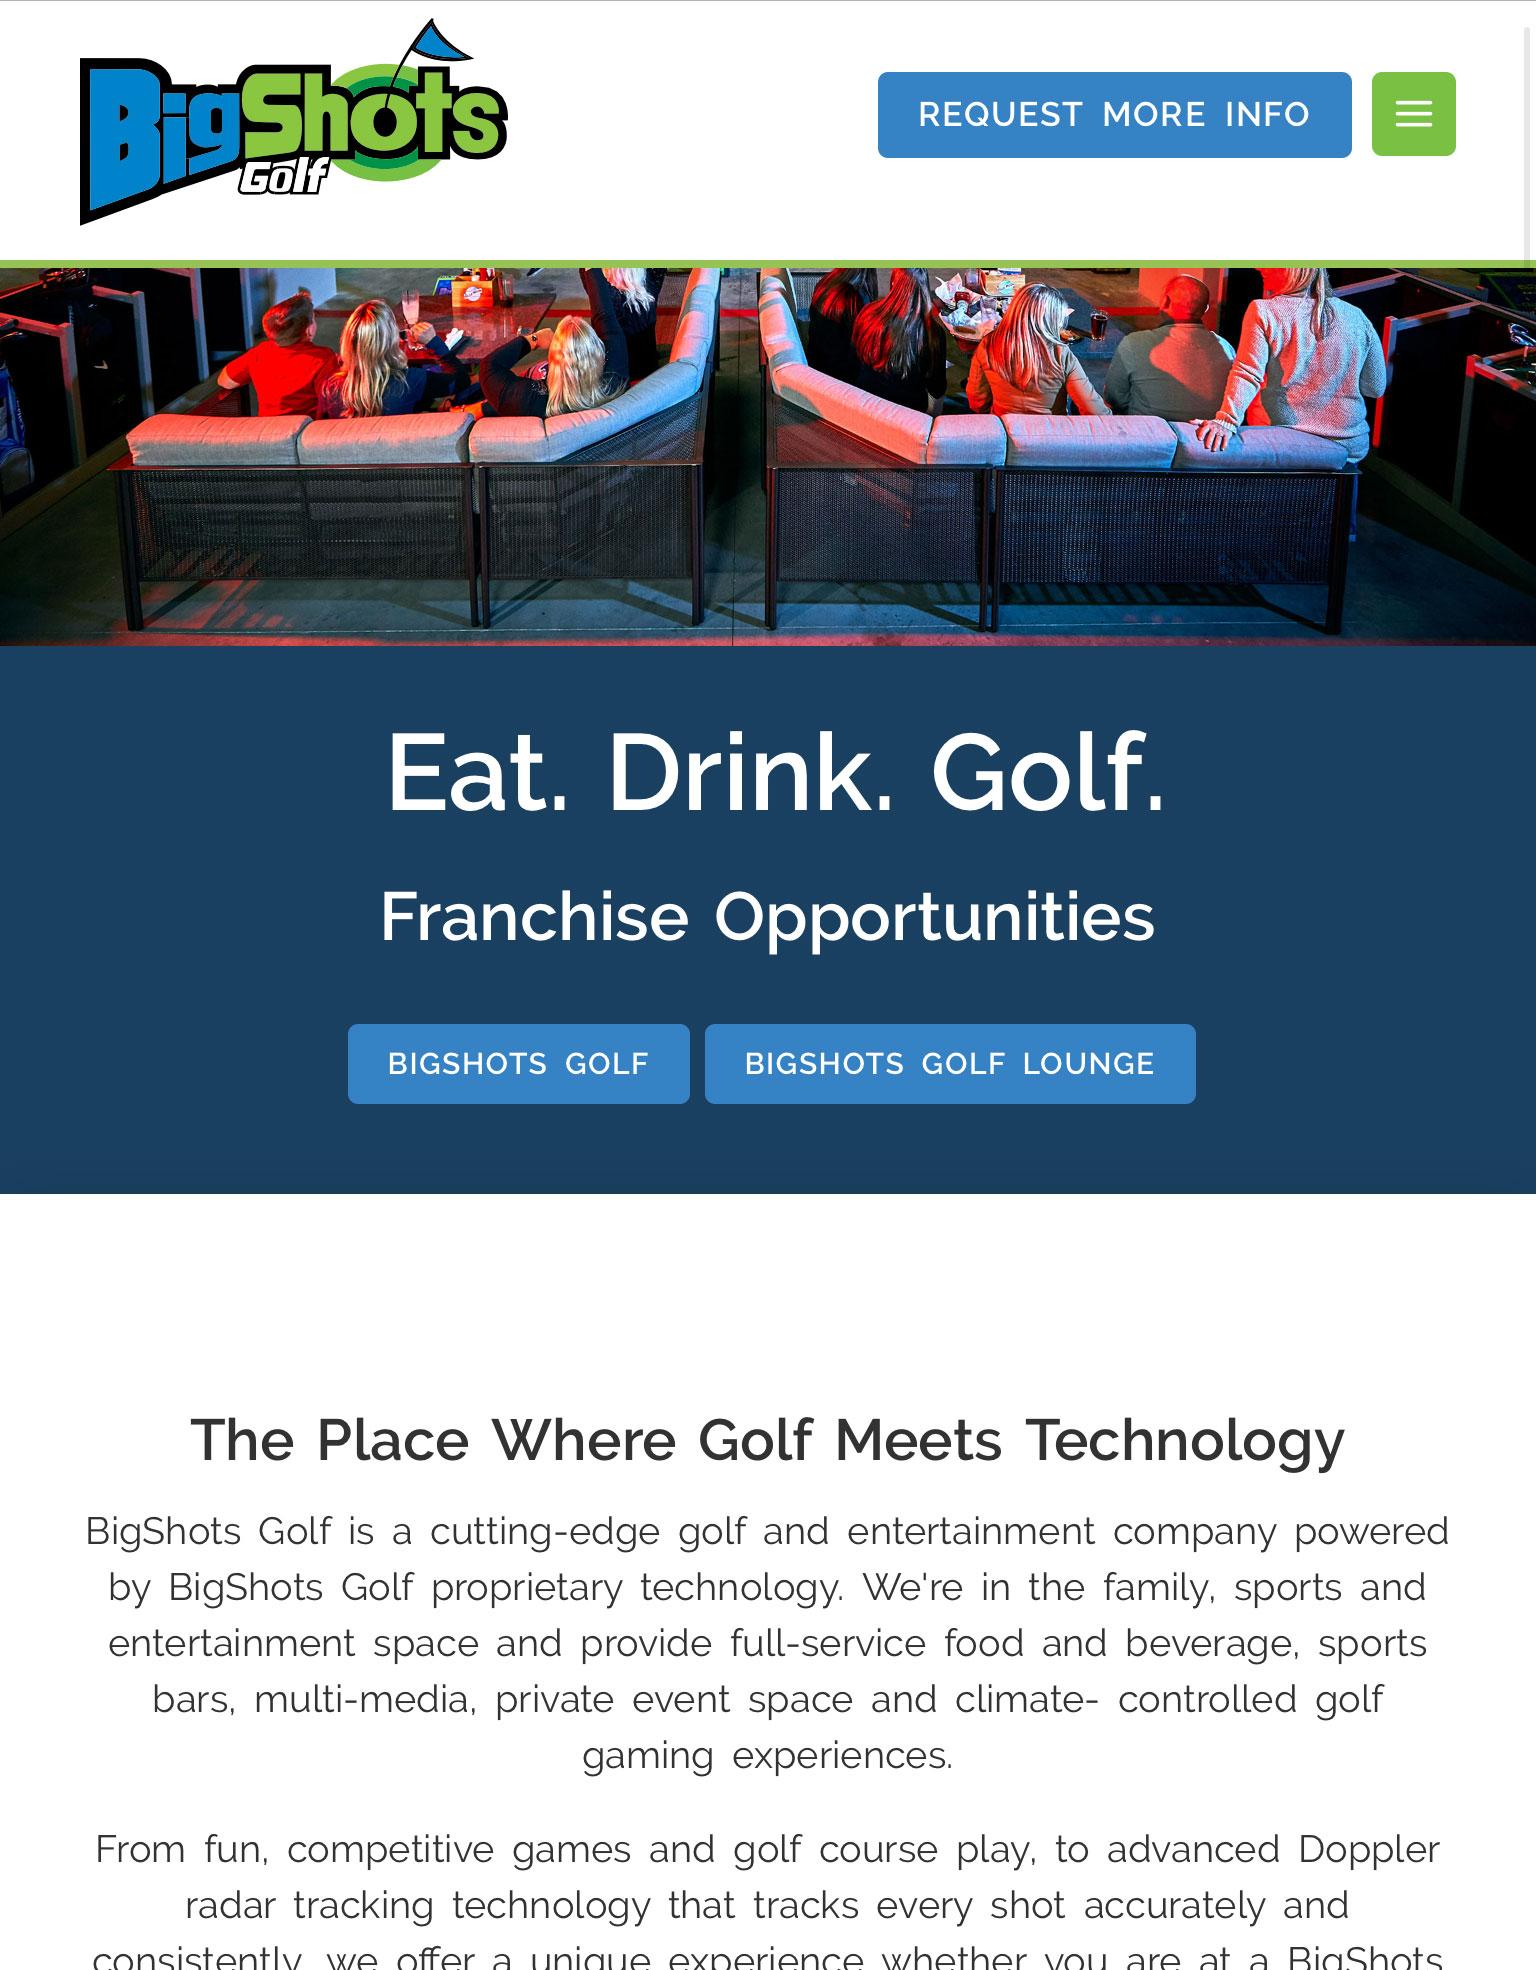 bigshots-golf-peoria-tablet-web-design-1